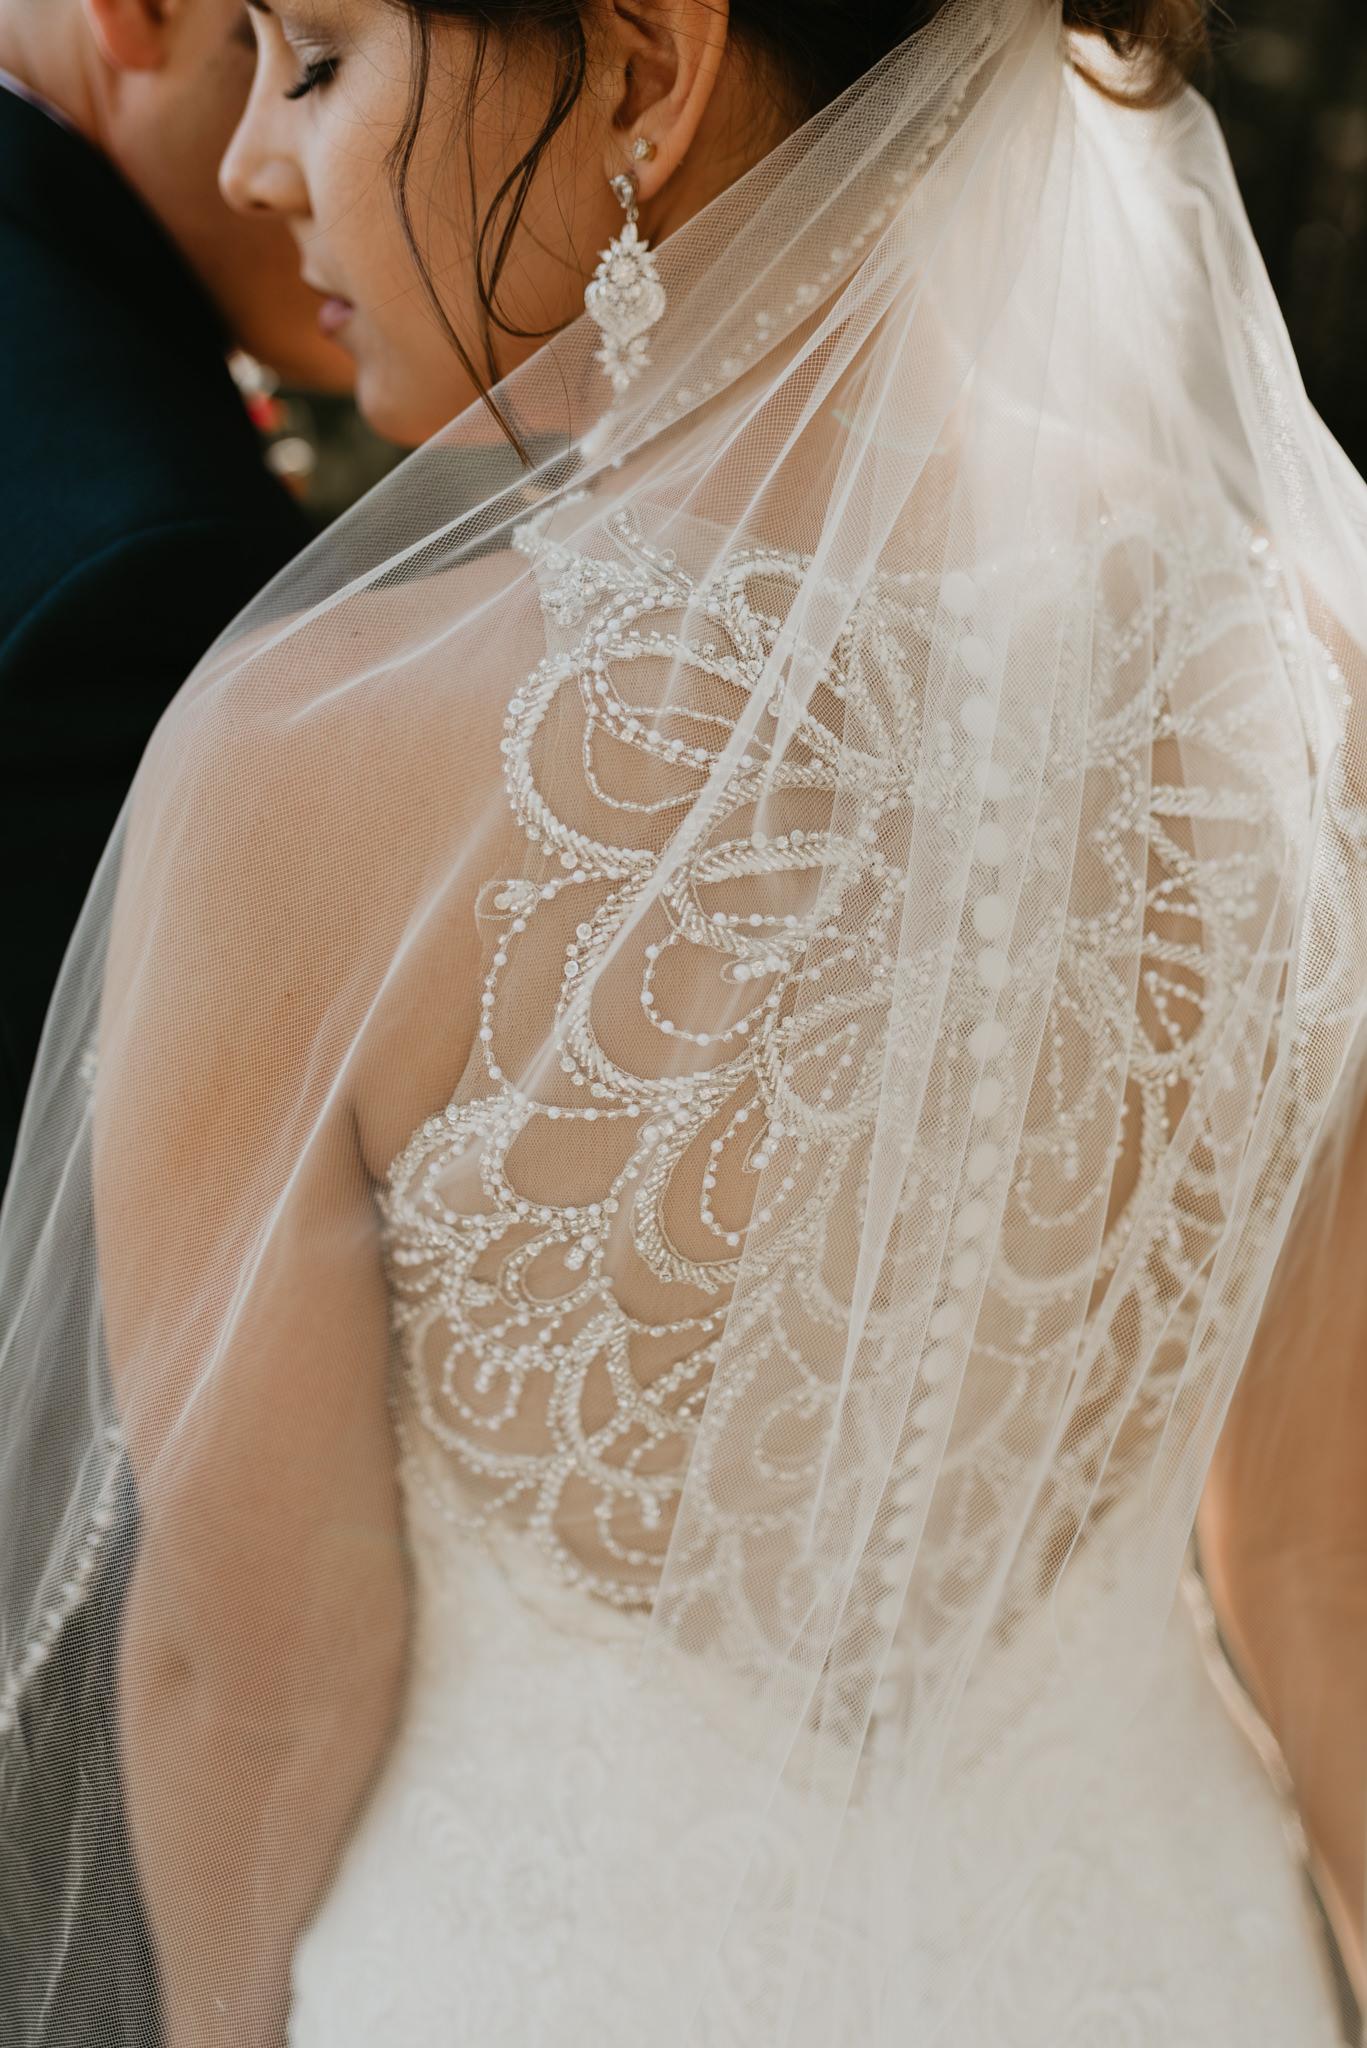 Oklahoma-Wedding-Photography-1.jpg